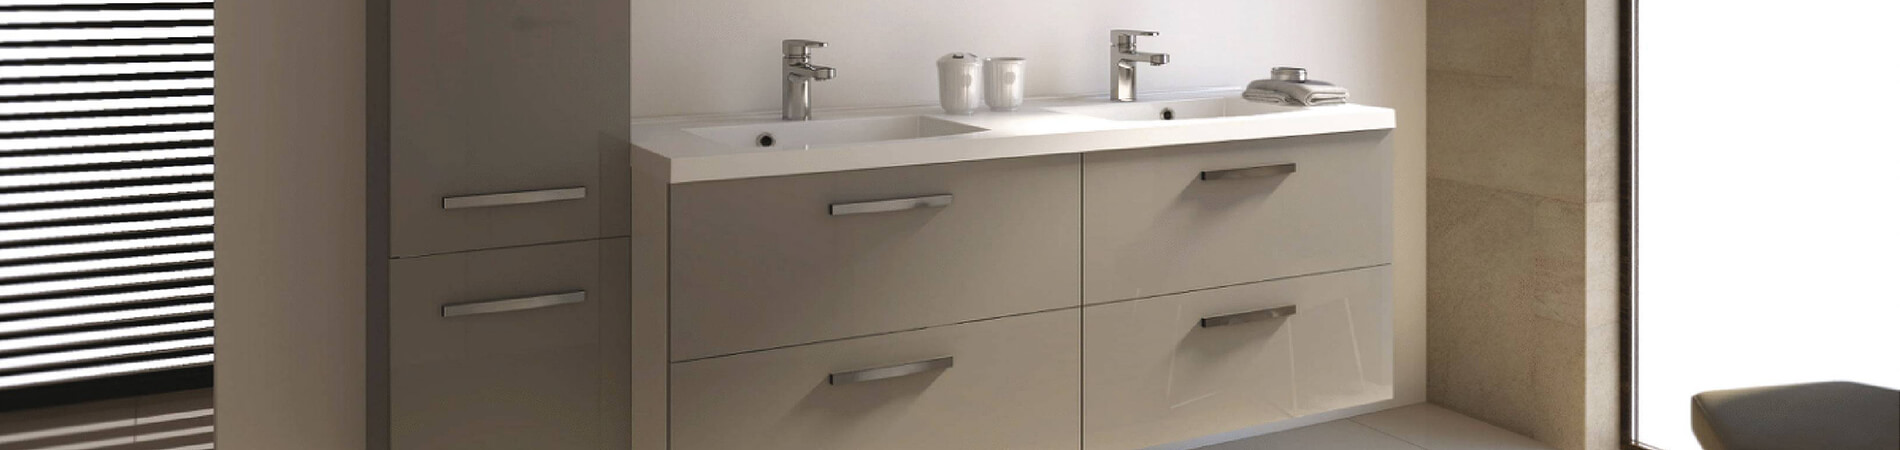 meuble de salle de bain vente agencement installation. Black Bedroom Furniture Sets. Home Design Ideas